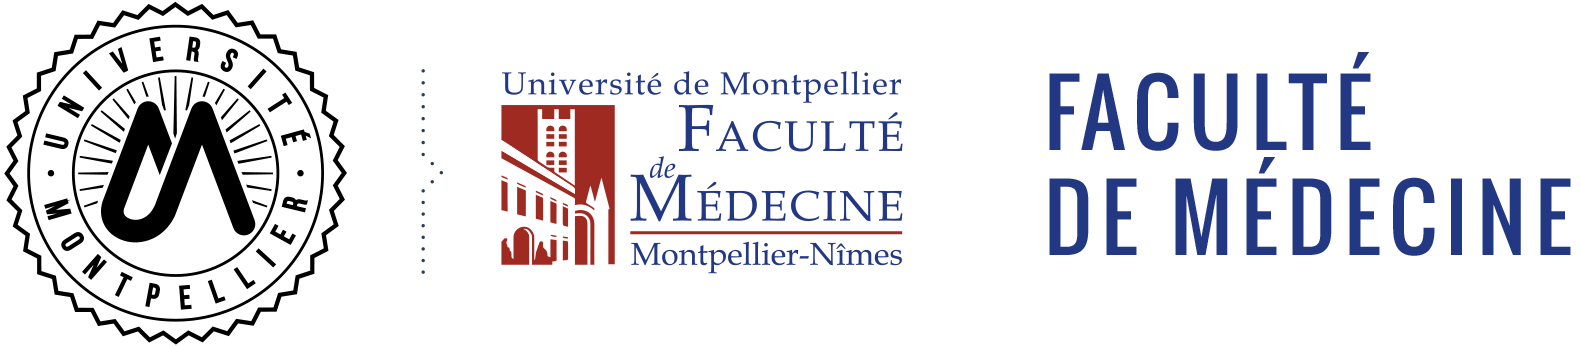 Logo faculte de medecine montpellier